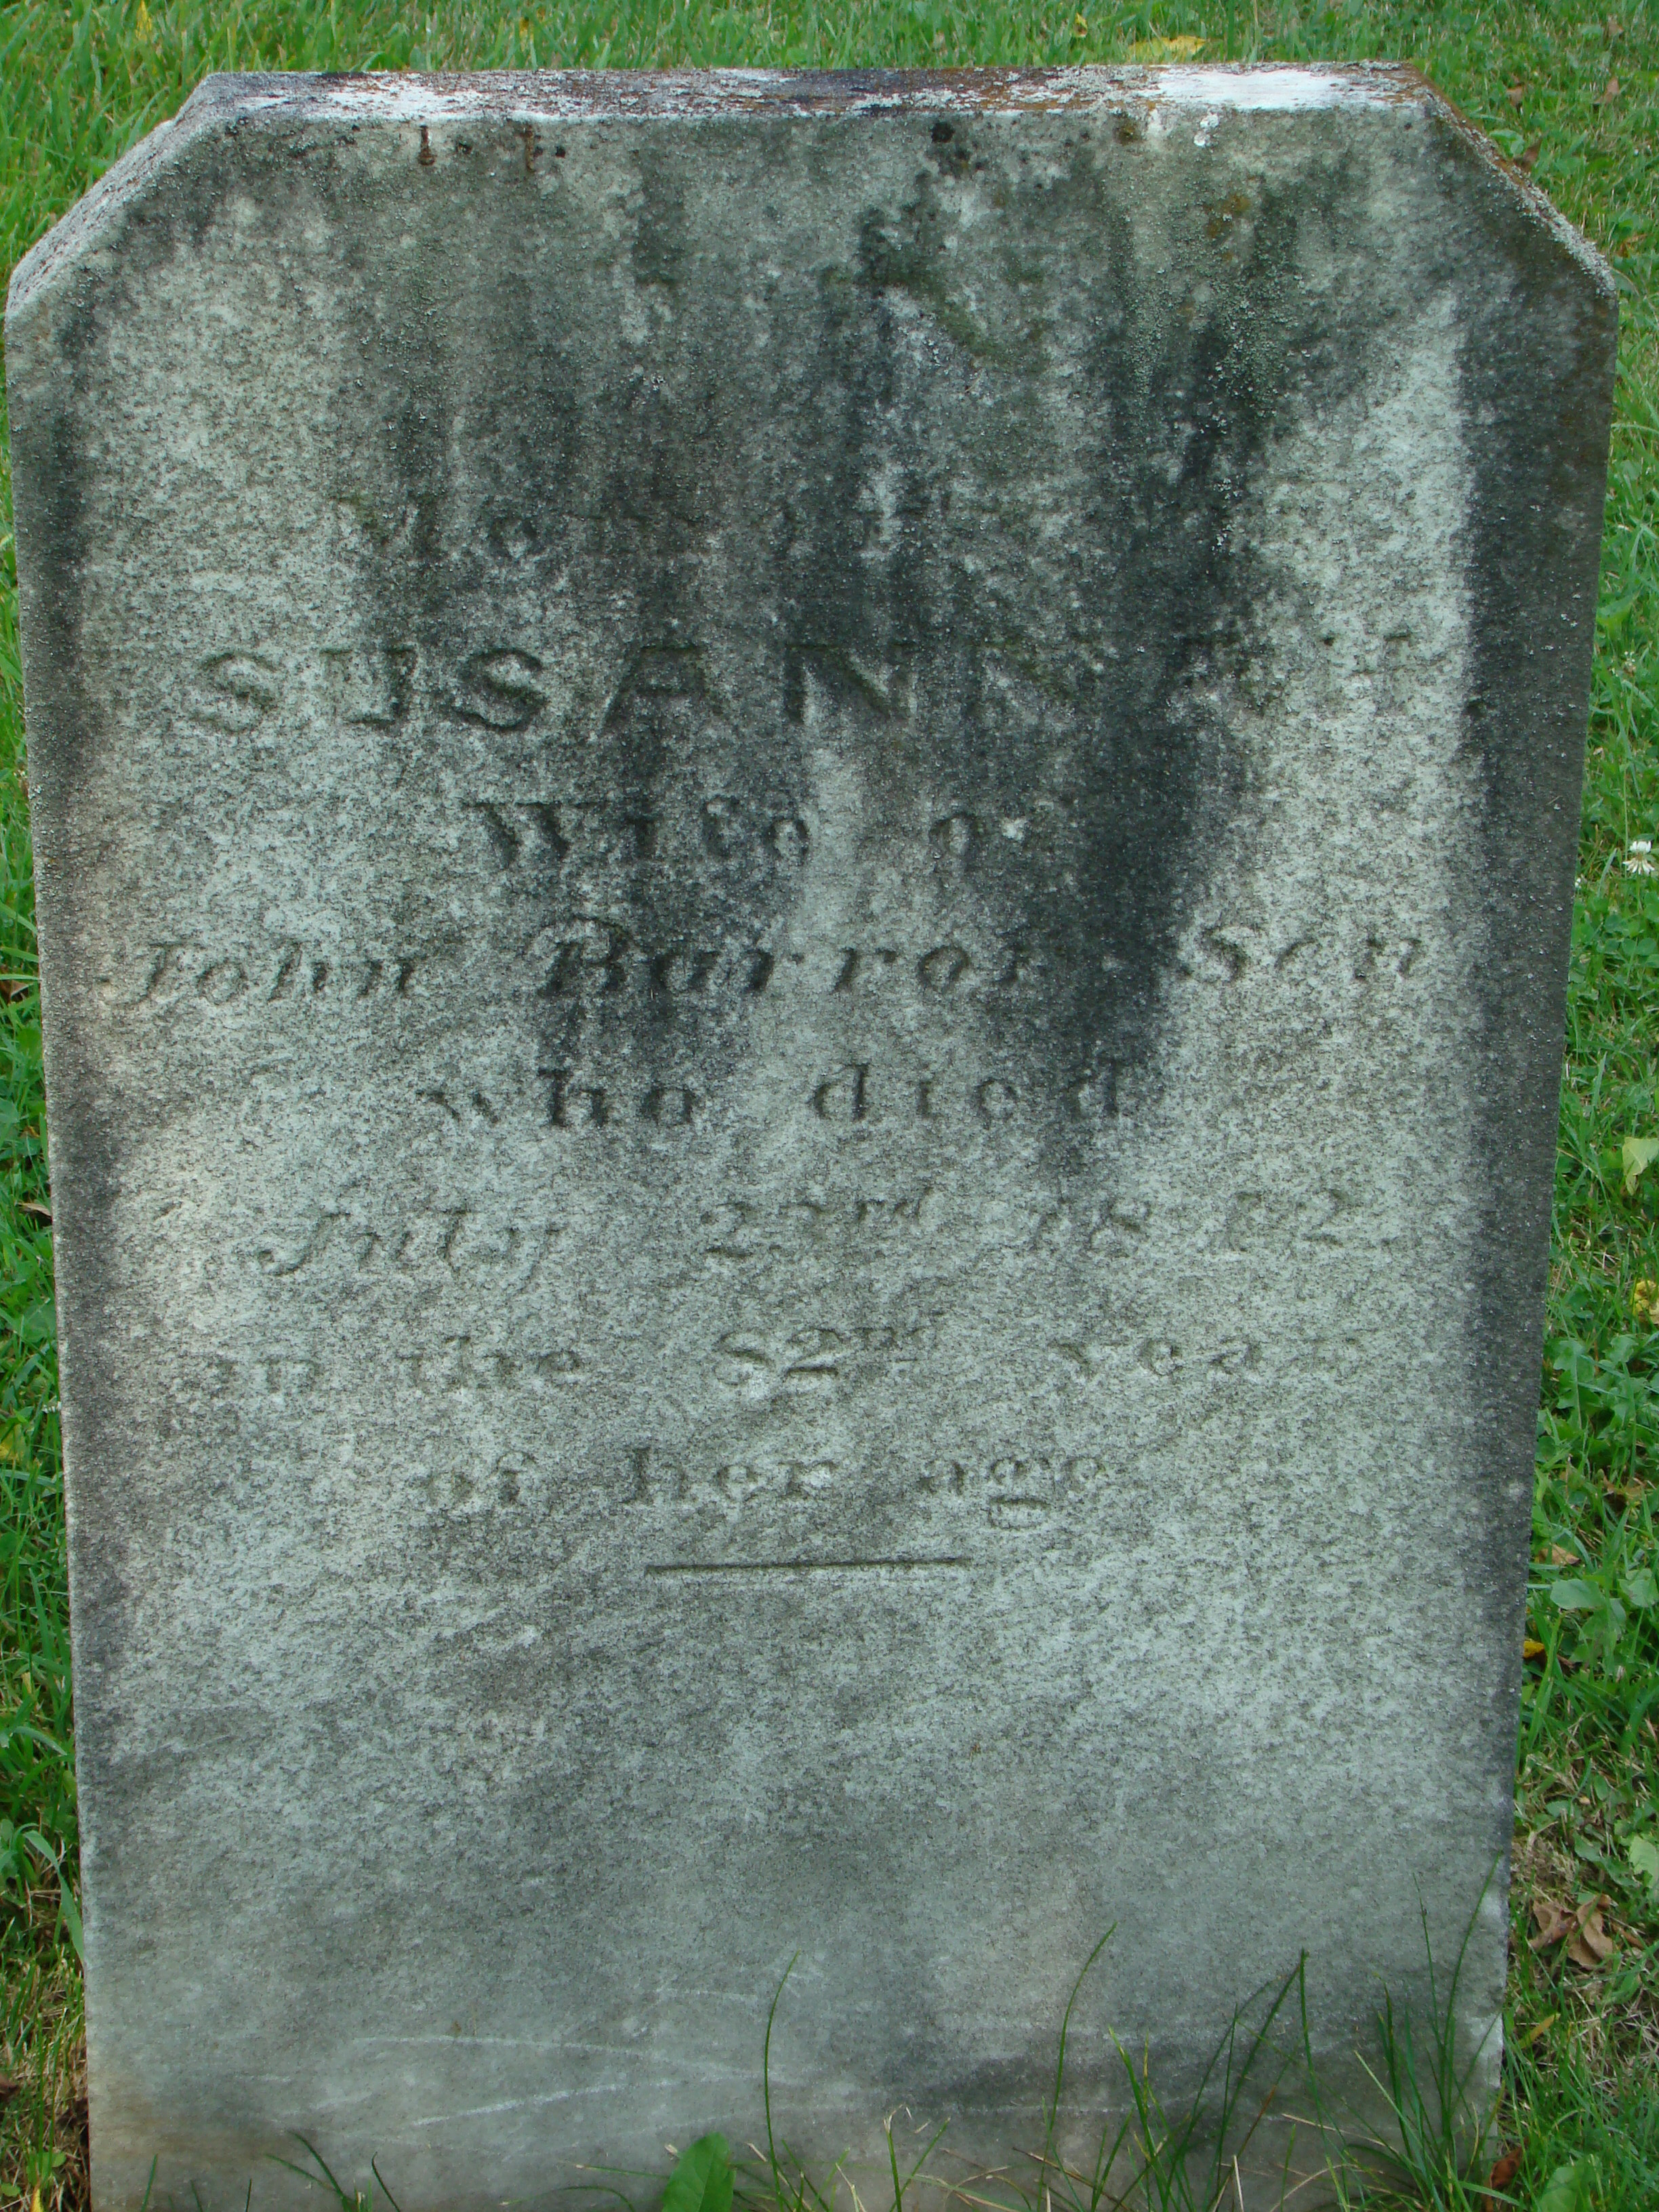 Susannah Ferguson